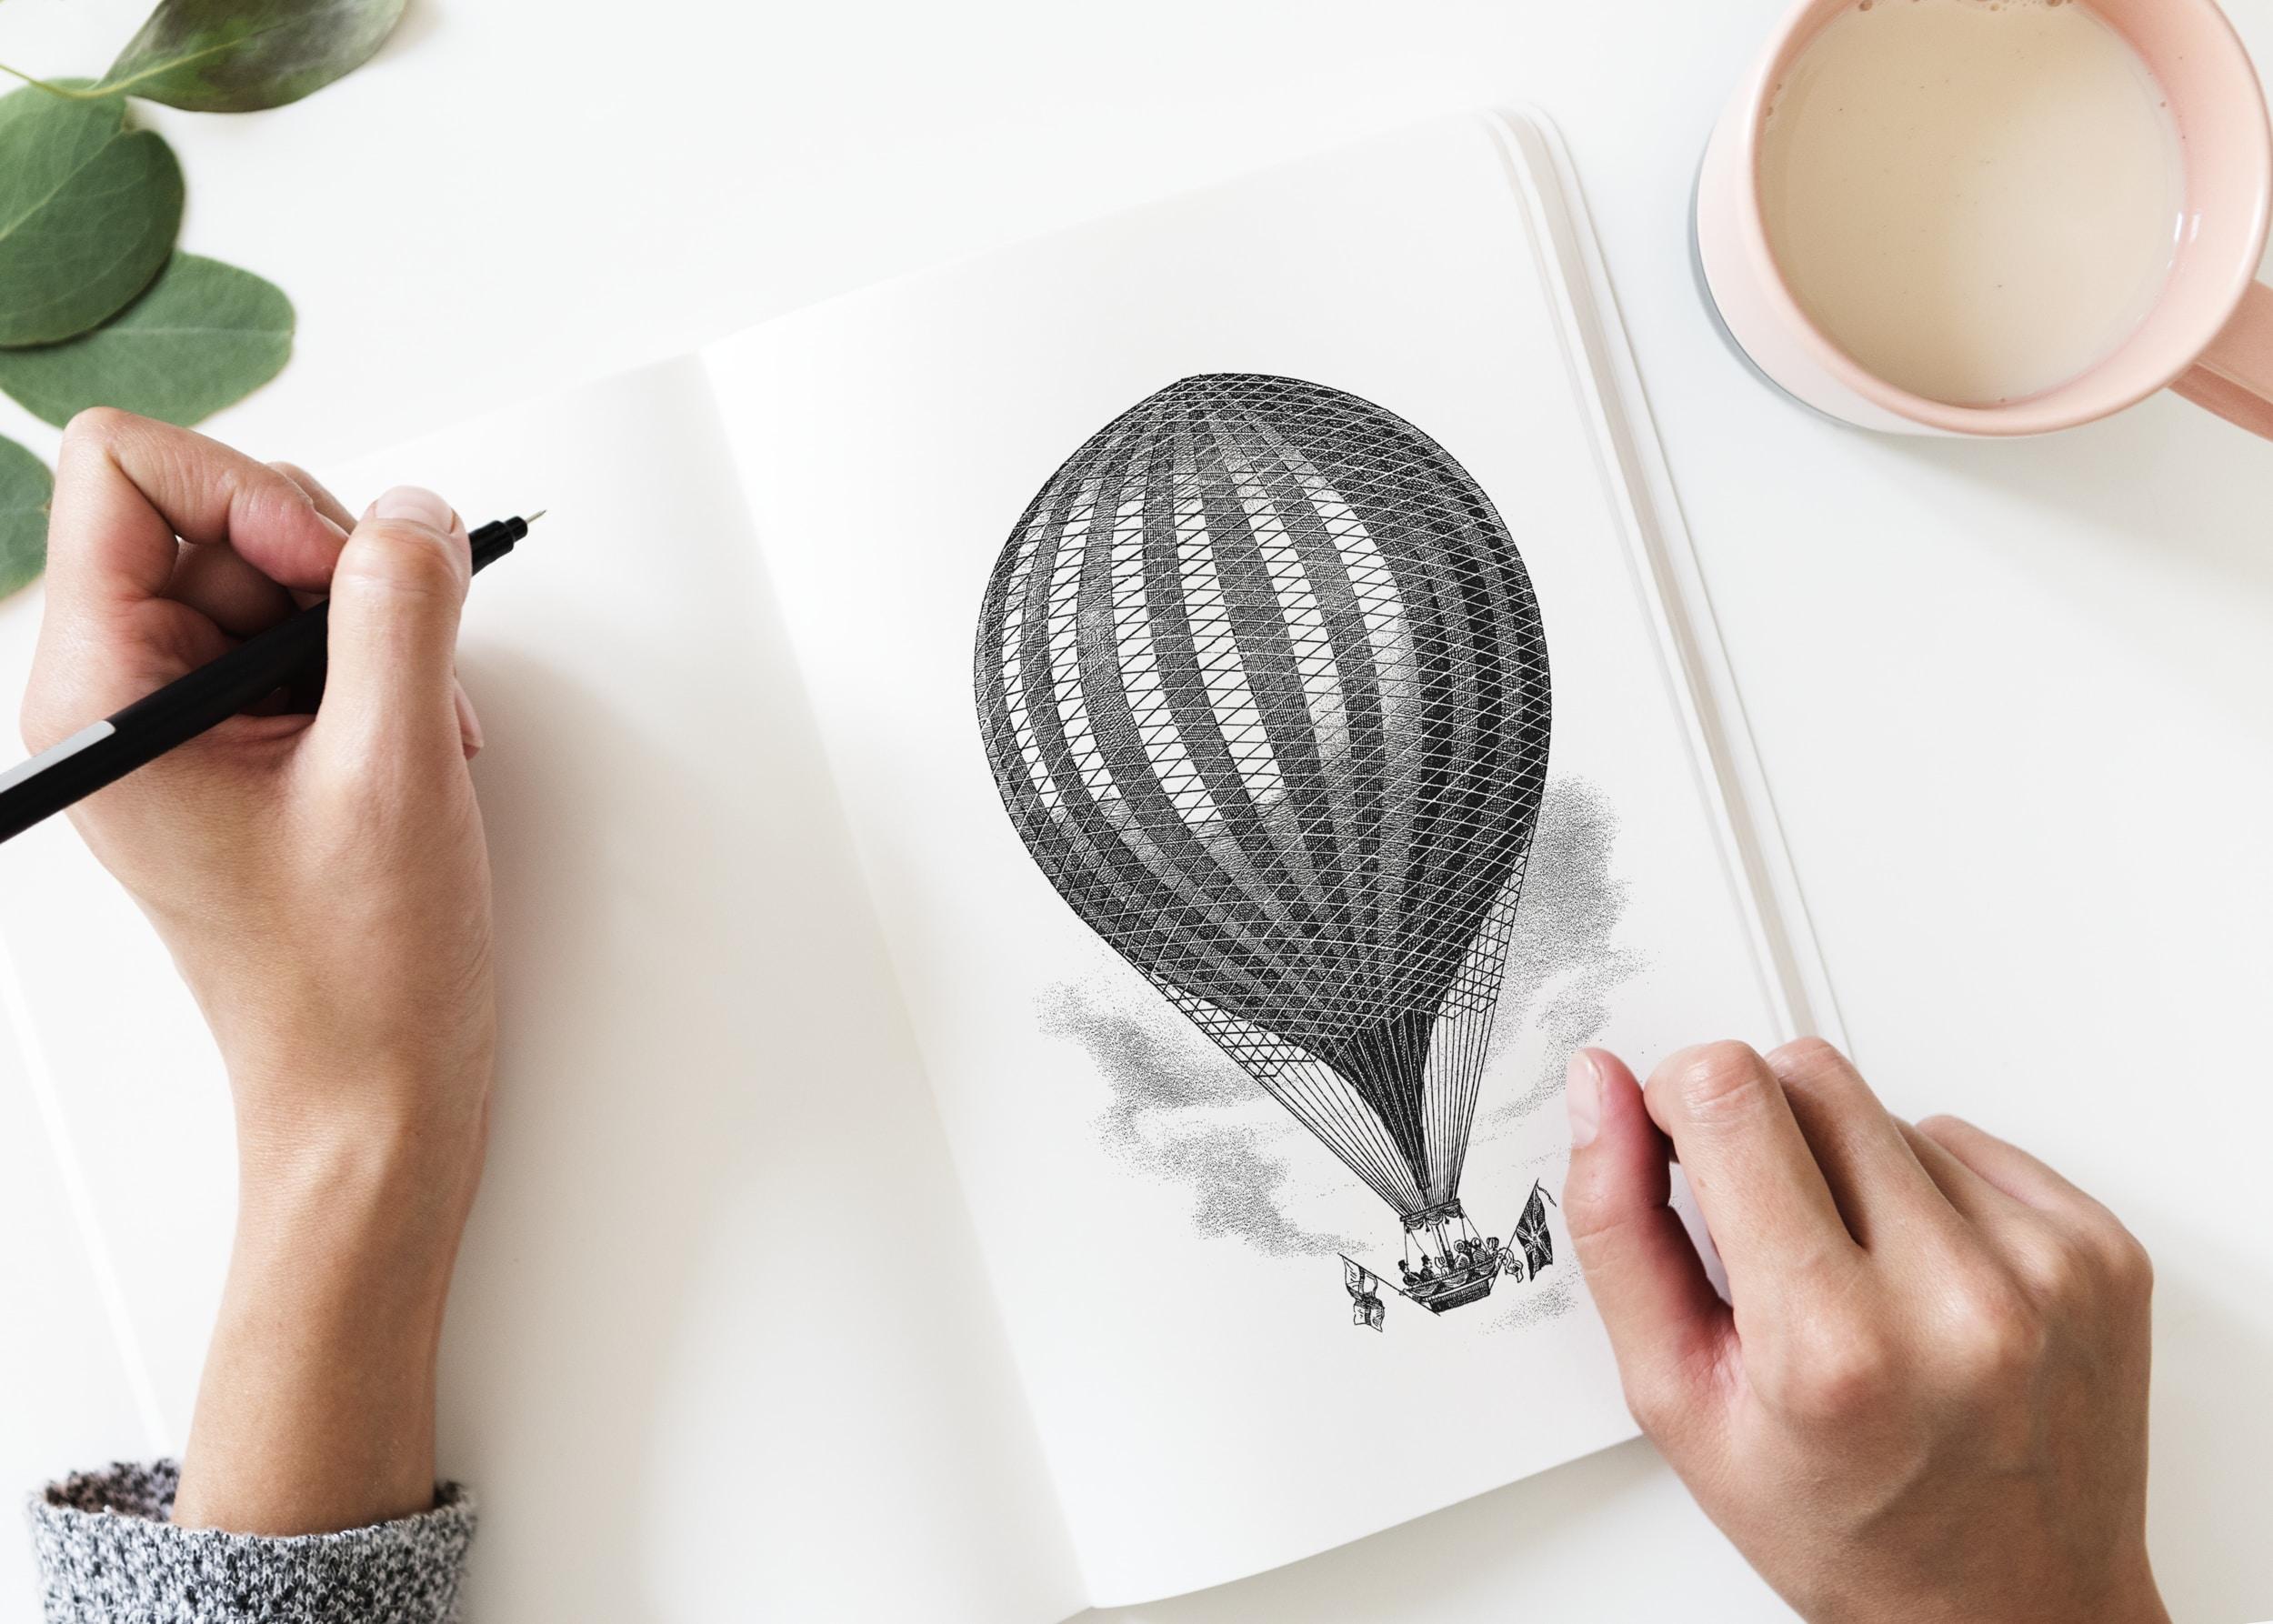 flay-lay photography of person sketching hot air balloon